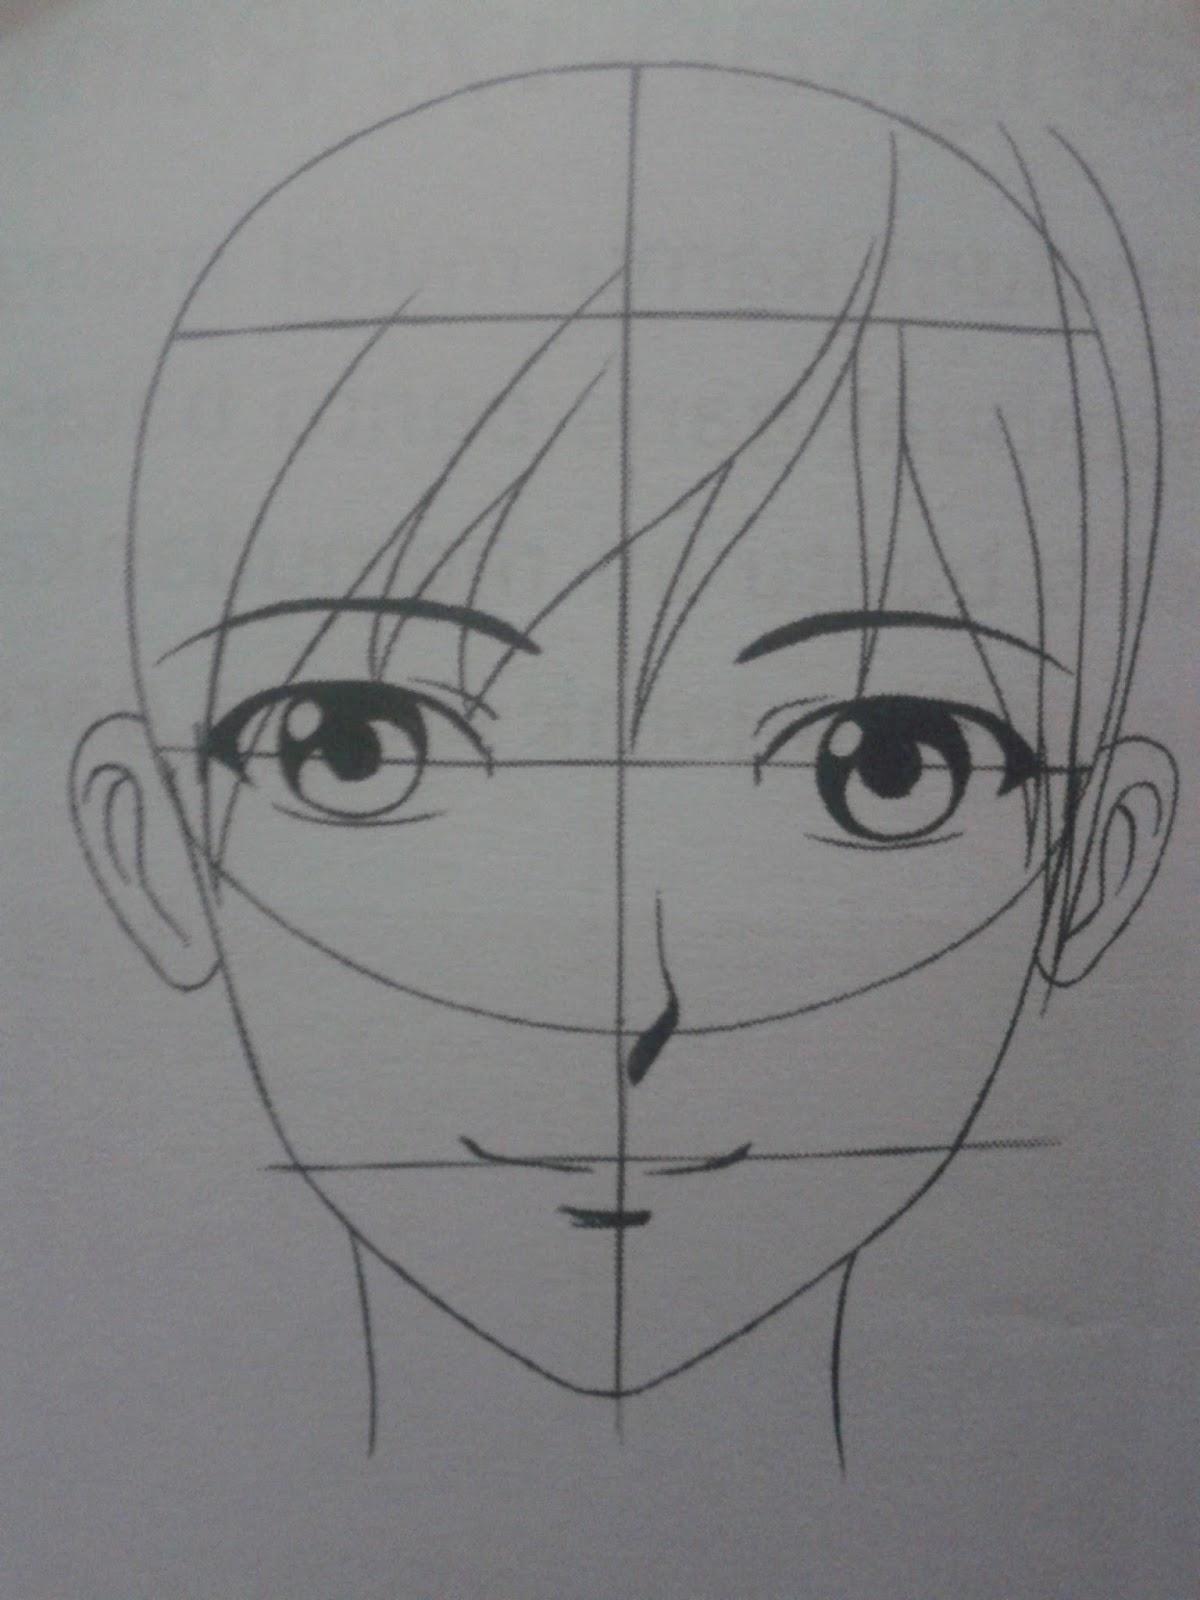 Teknik dasar menggambar manga untuk pemula triktutorial